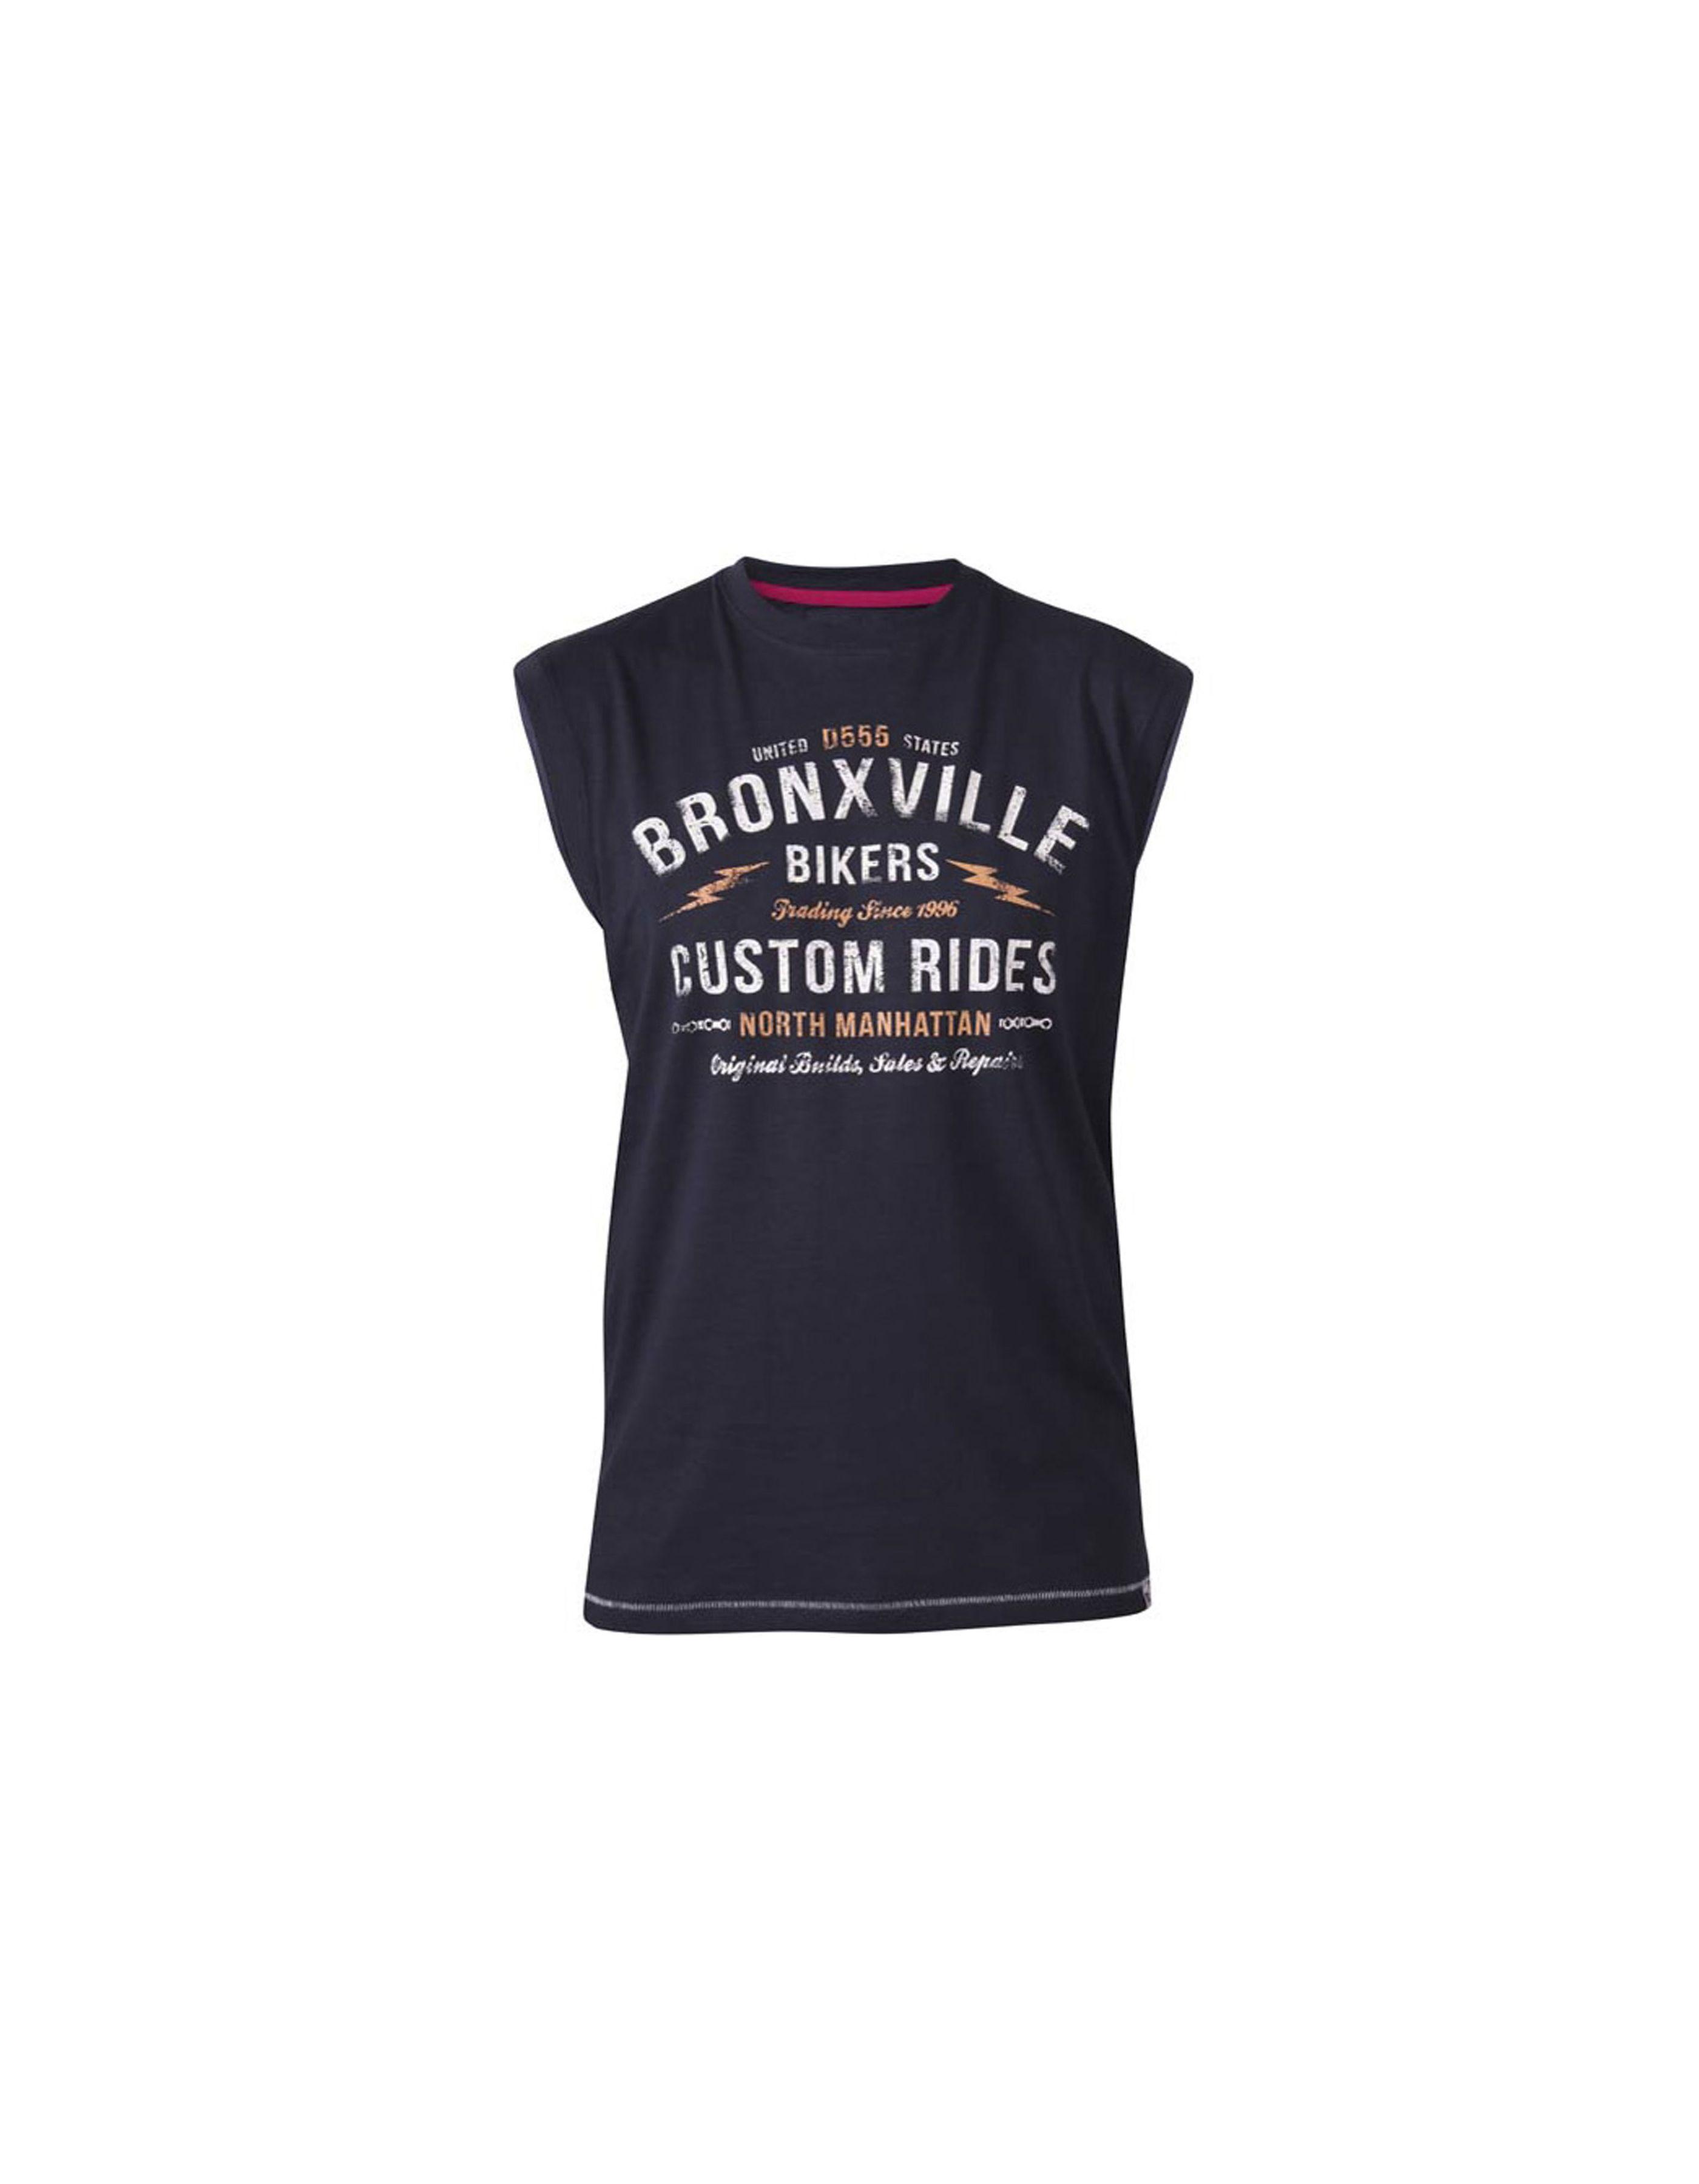 T shirt sans manches Bronxville